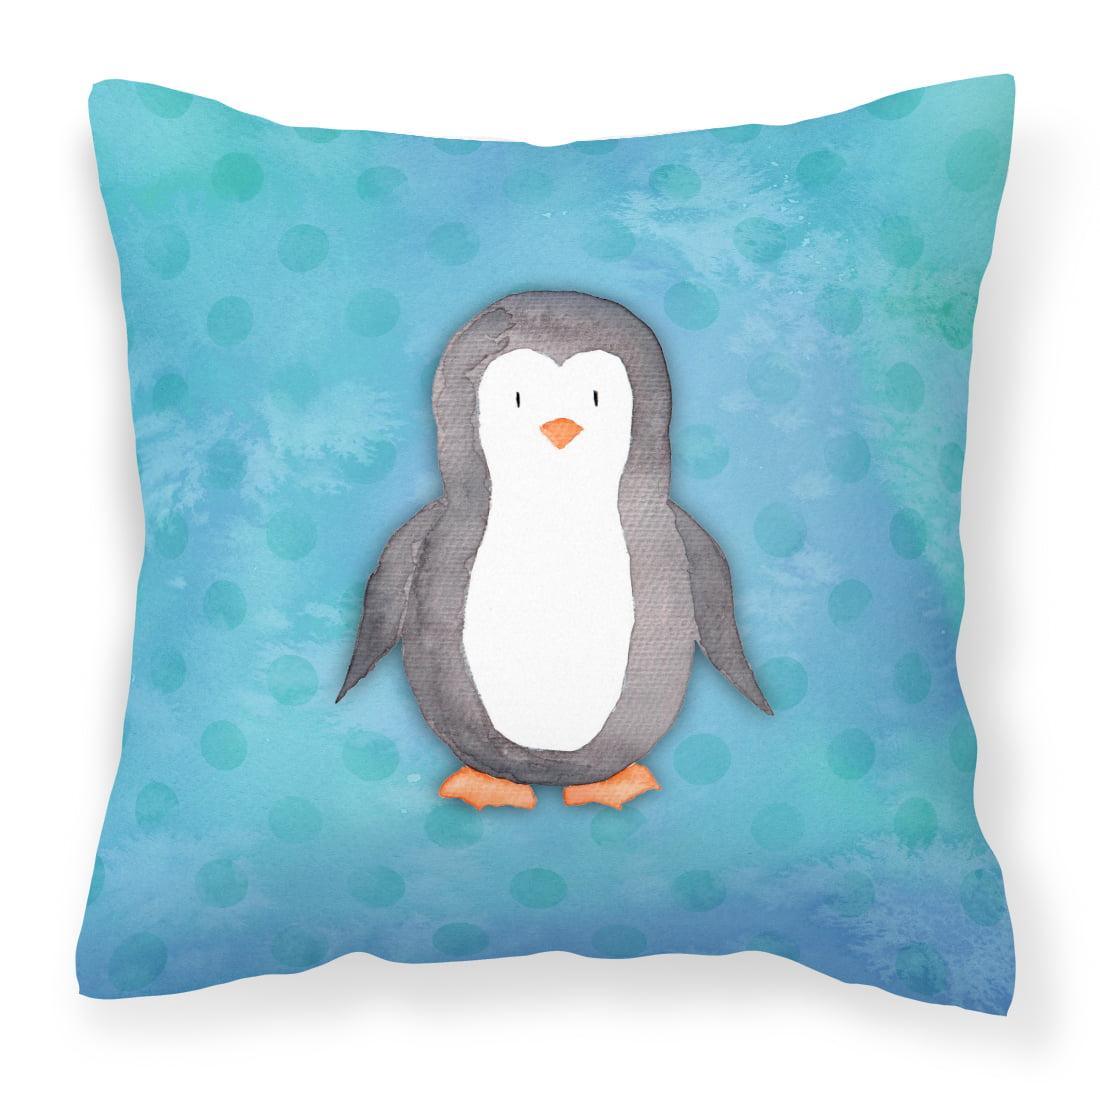 Polkadot Penguin Watercolor Fabric Decorative Pillow BB7376PW1818